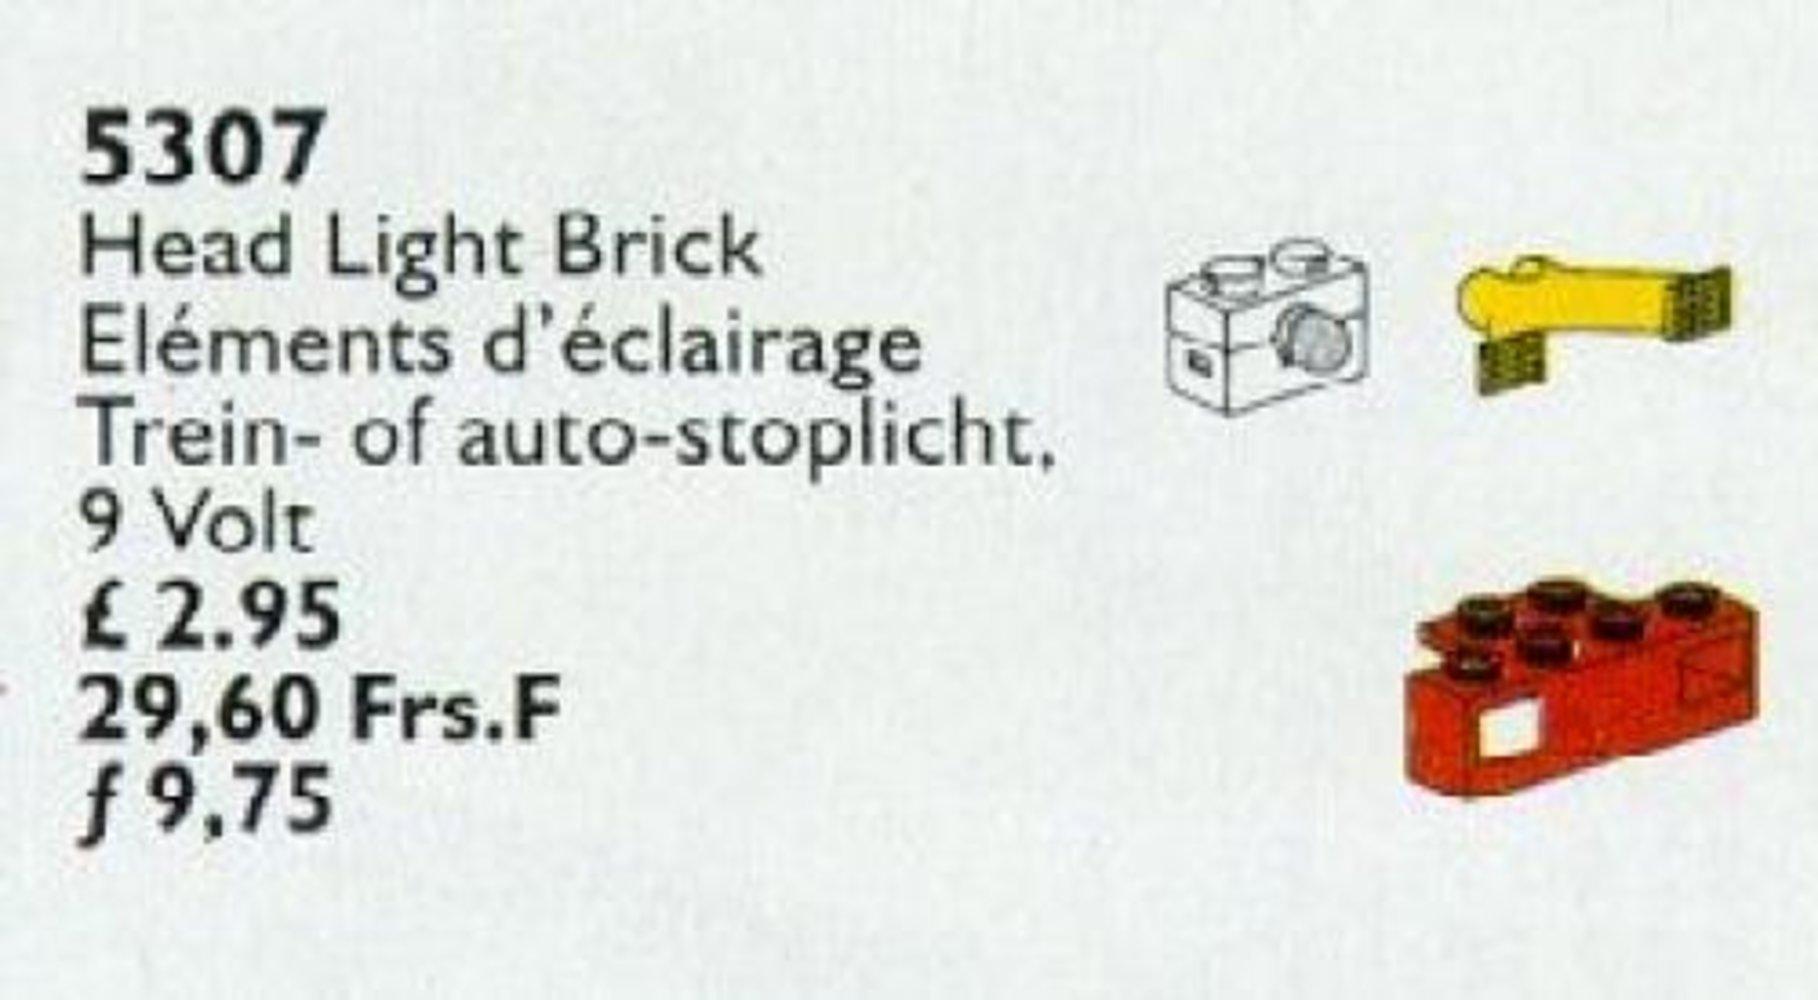 Head Light Brick